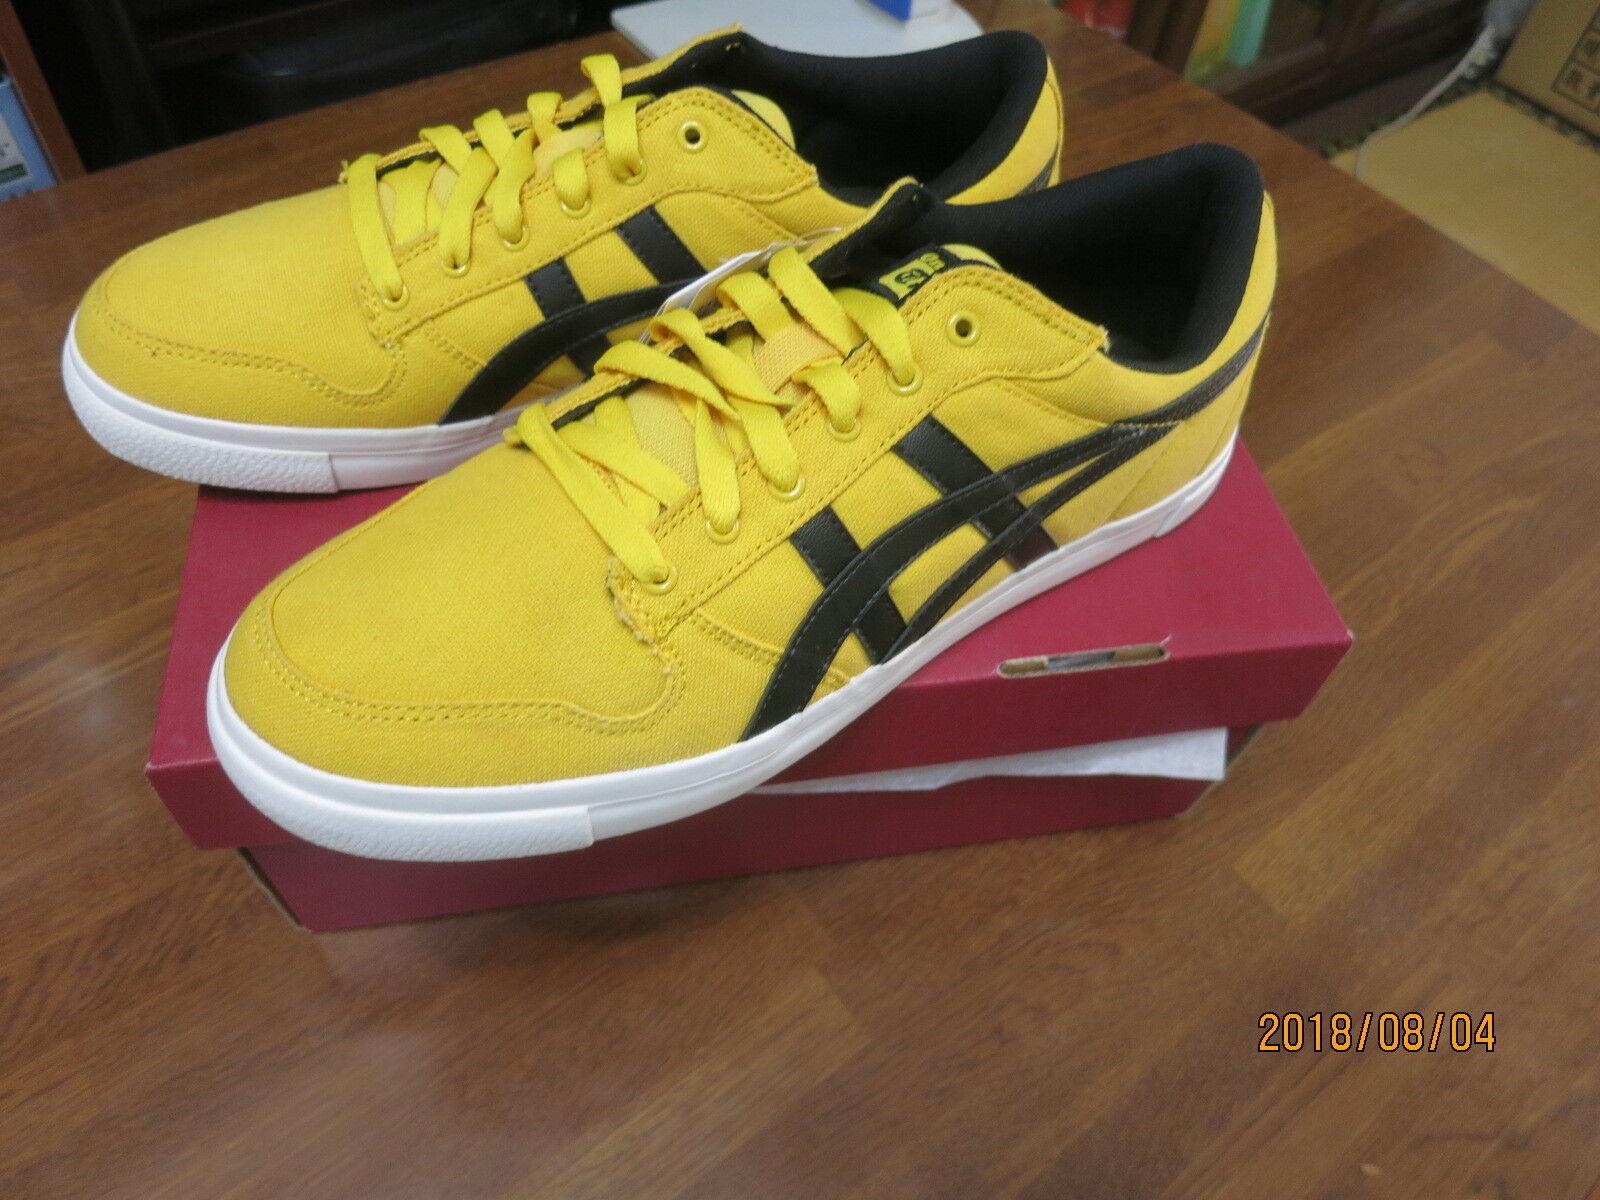 Asics Onitsuka Tiger Yellow /Black  Shoes A-SYS  SIZE USJP28.0